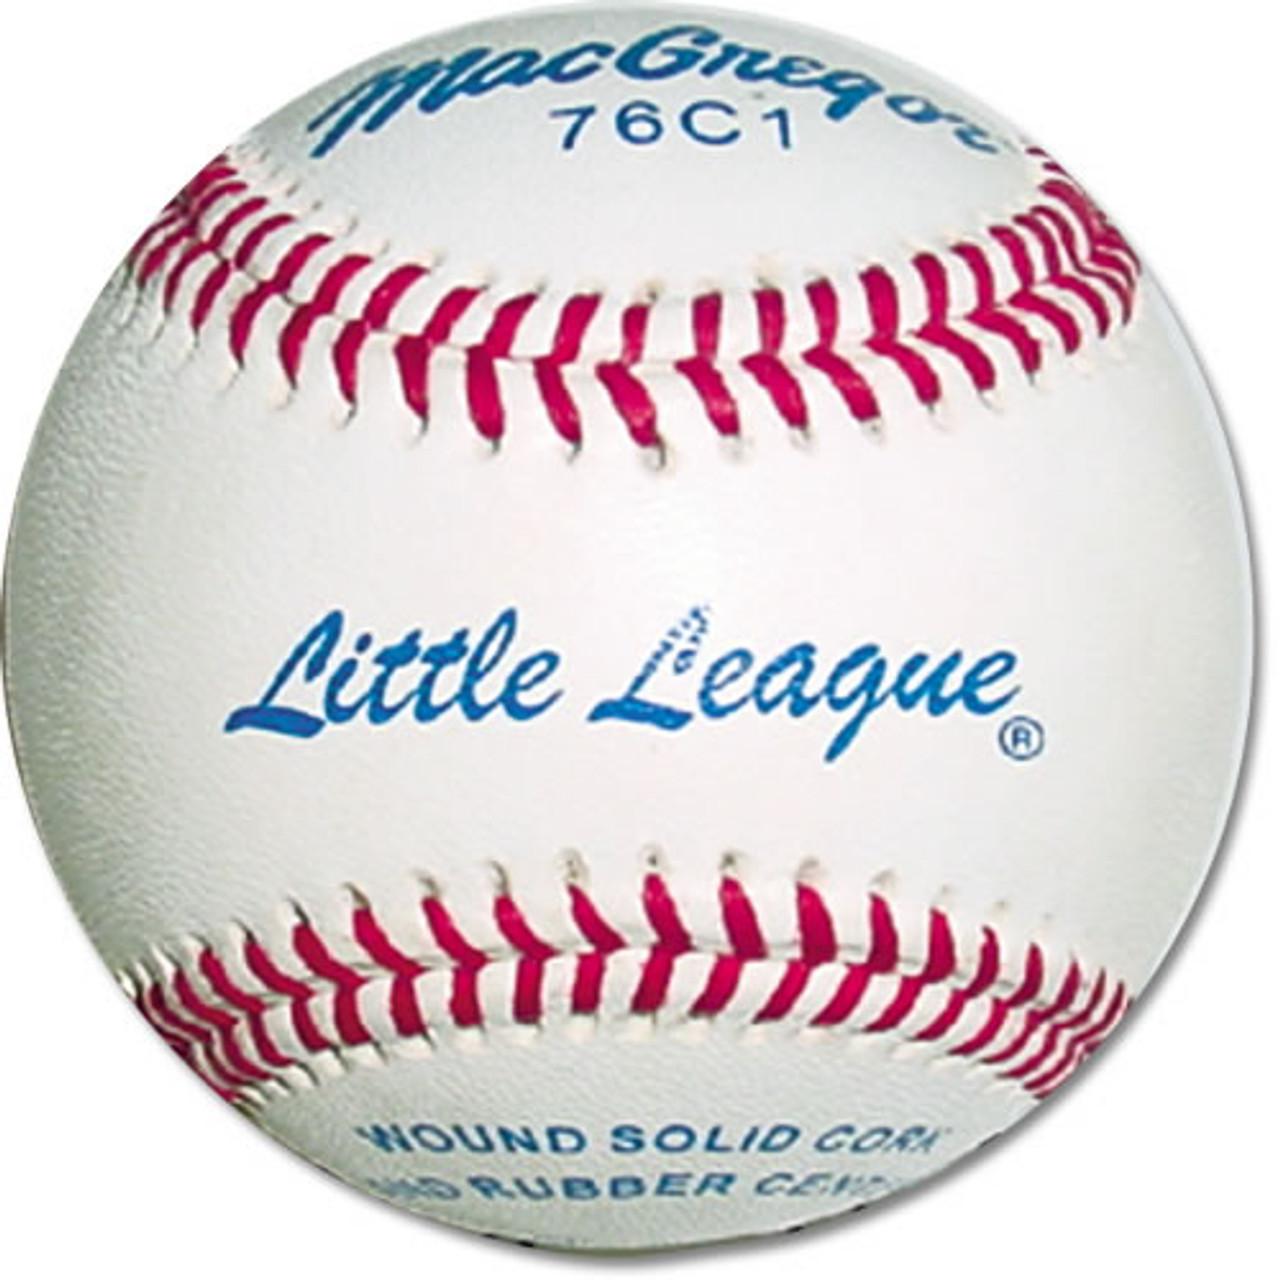 MacGregor #76 C1 Little League Baseballs